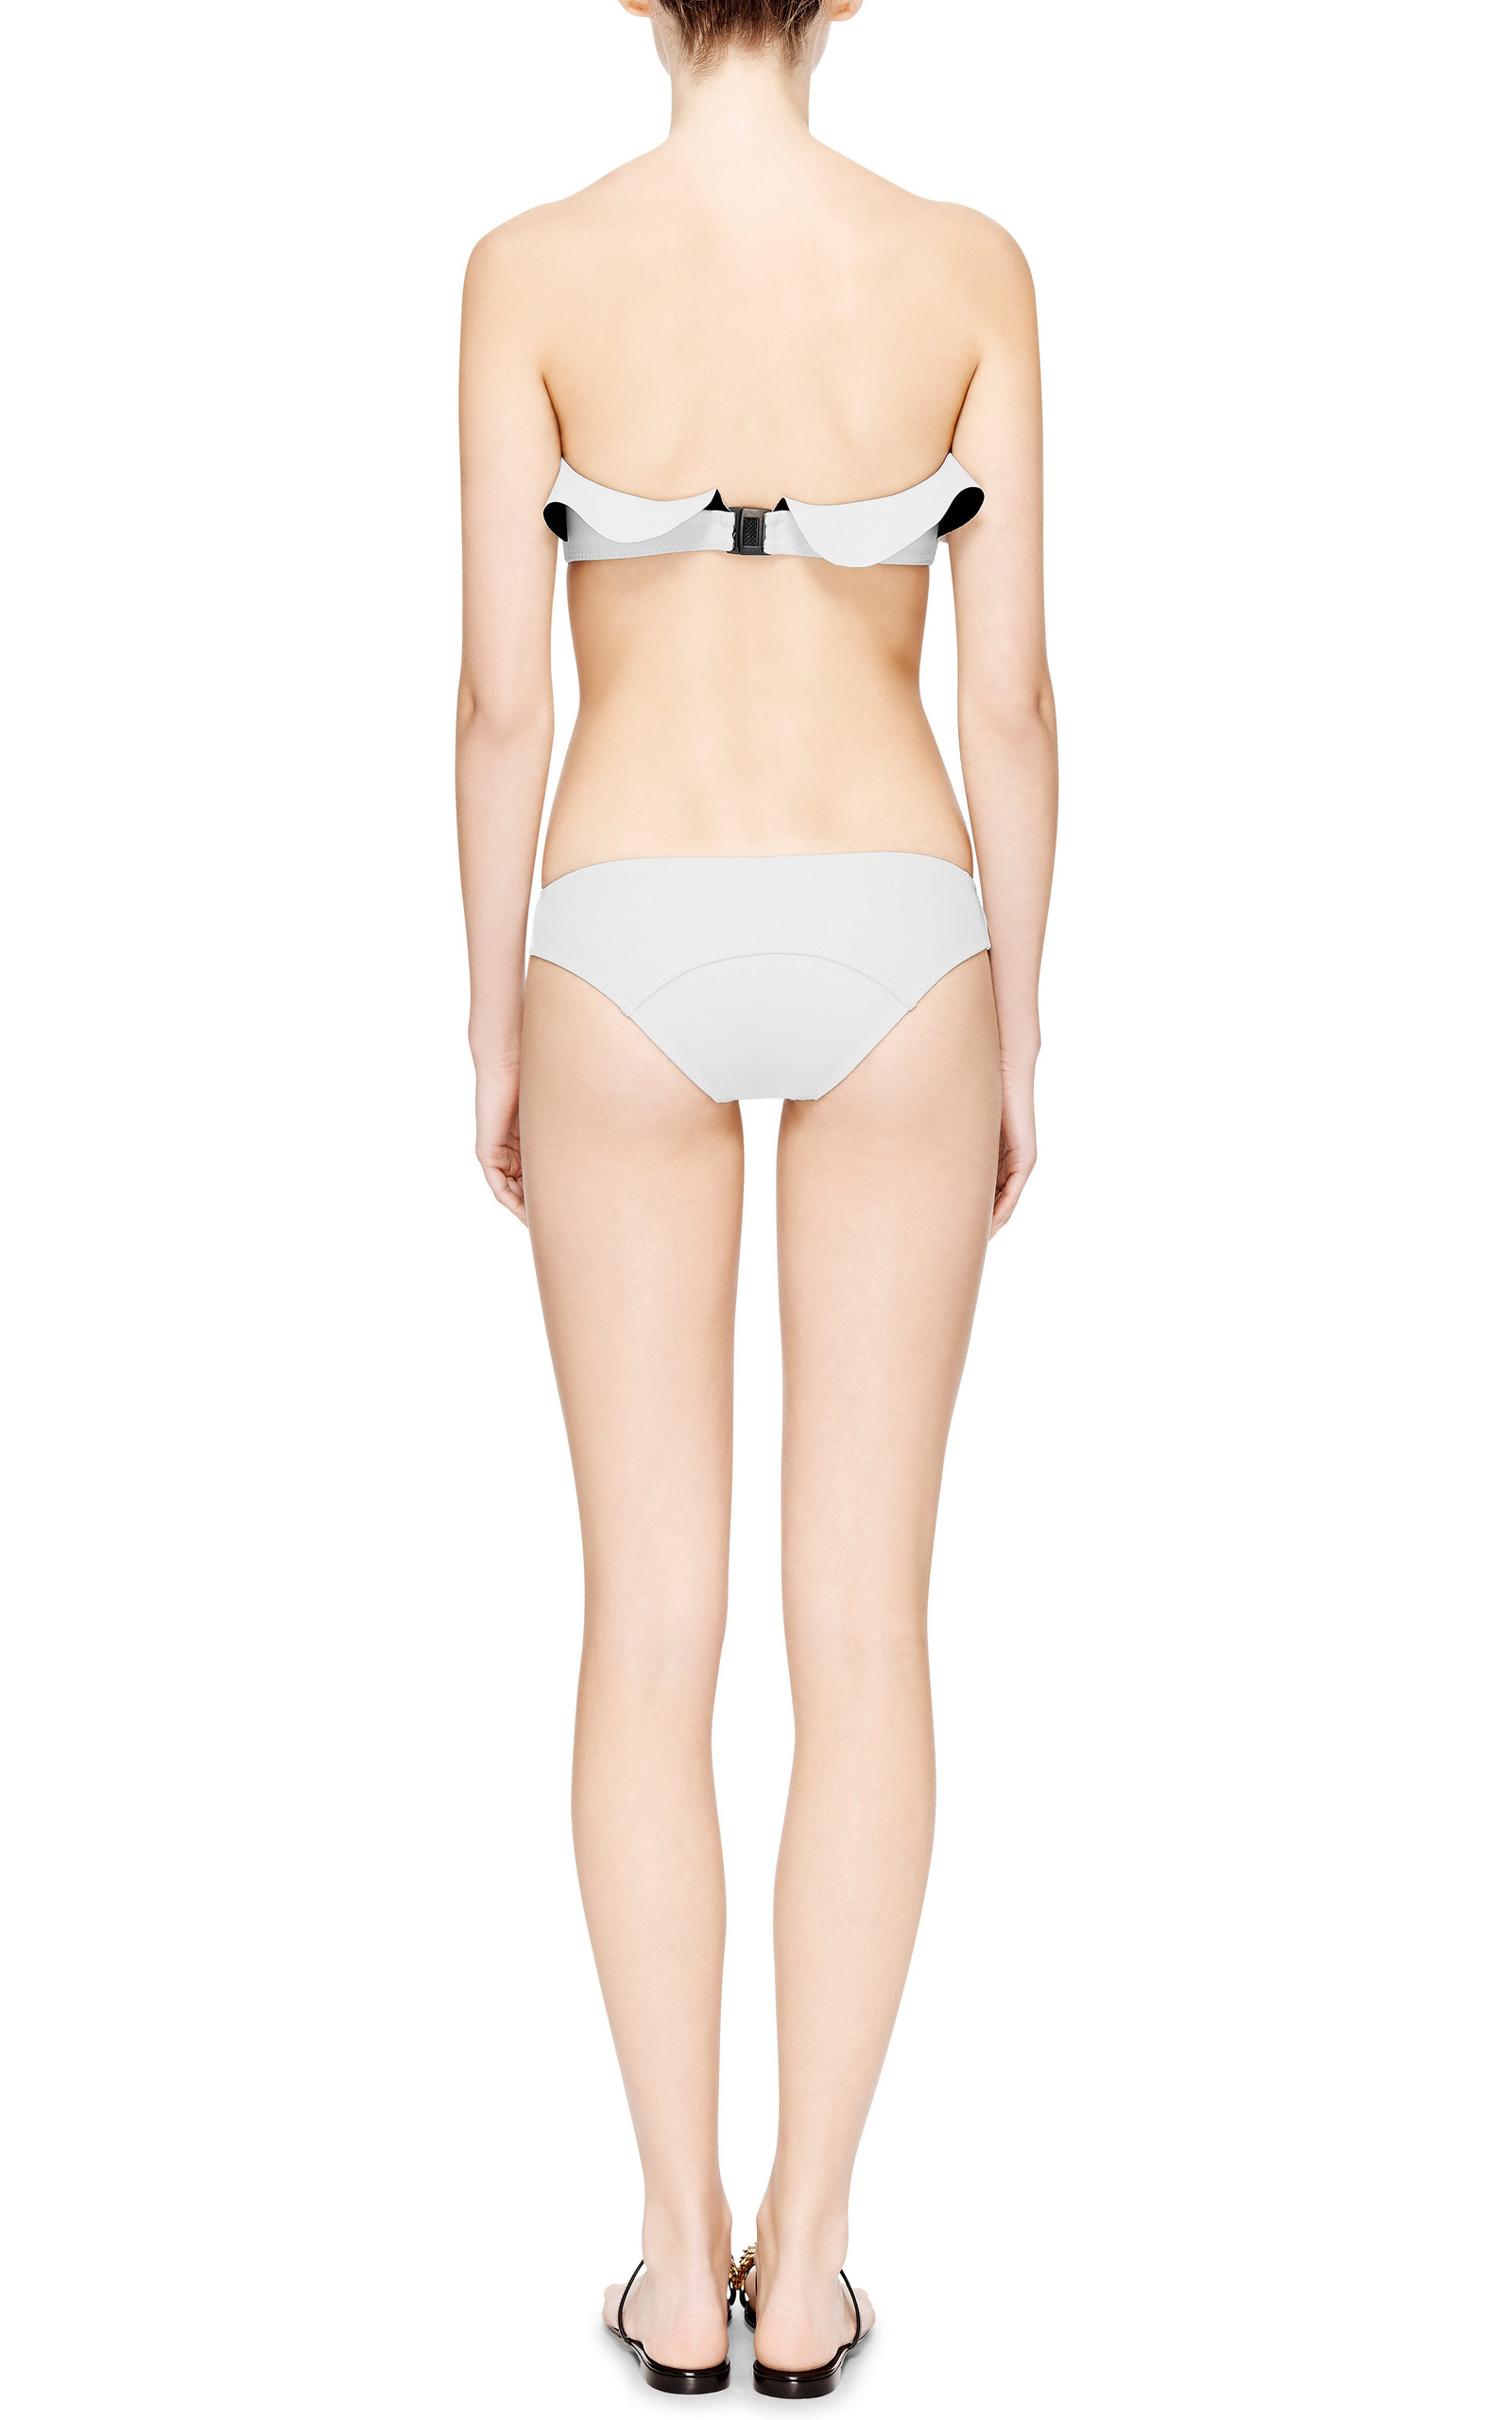 8fb6dd60dfa7b Lisa Marie FernandezNatalie Bonded Flounce Bikini. CLOSE. Loading. Loading